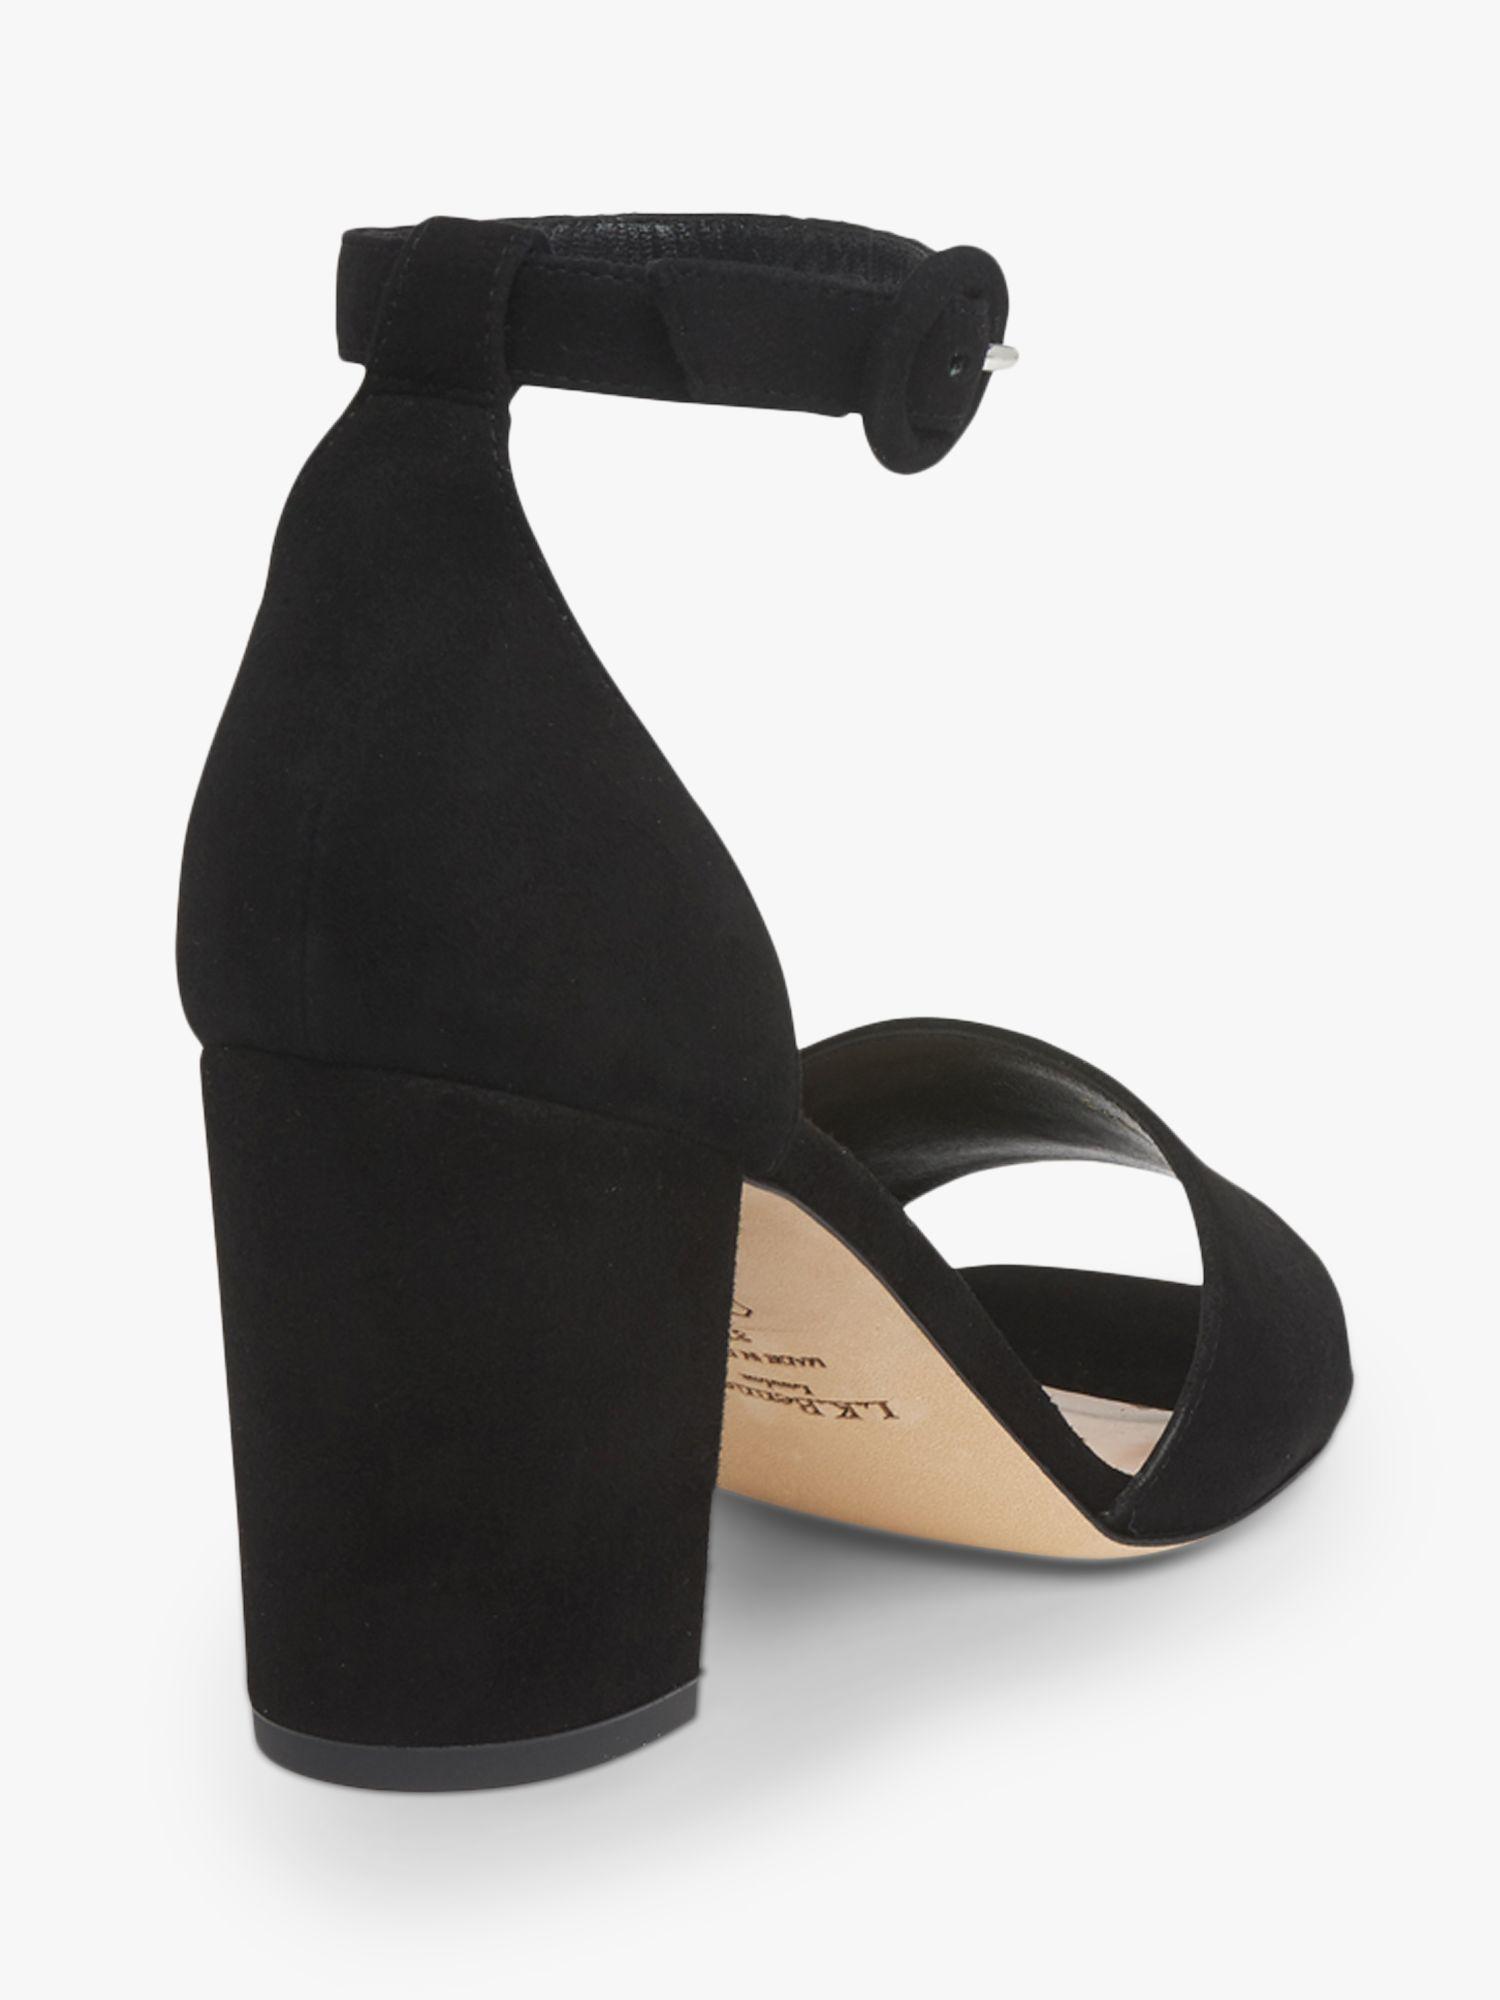 42589abb7b7 L.K.Bennett Hester Black Suede Block Heel Sandals in Black - Save 25 ...